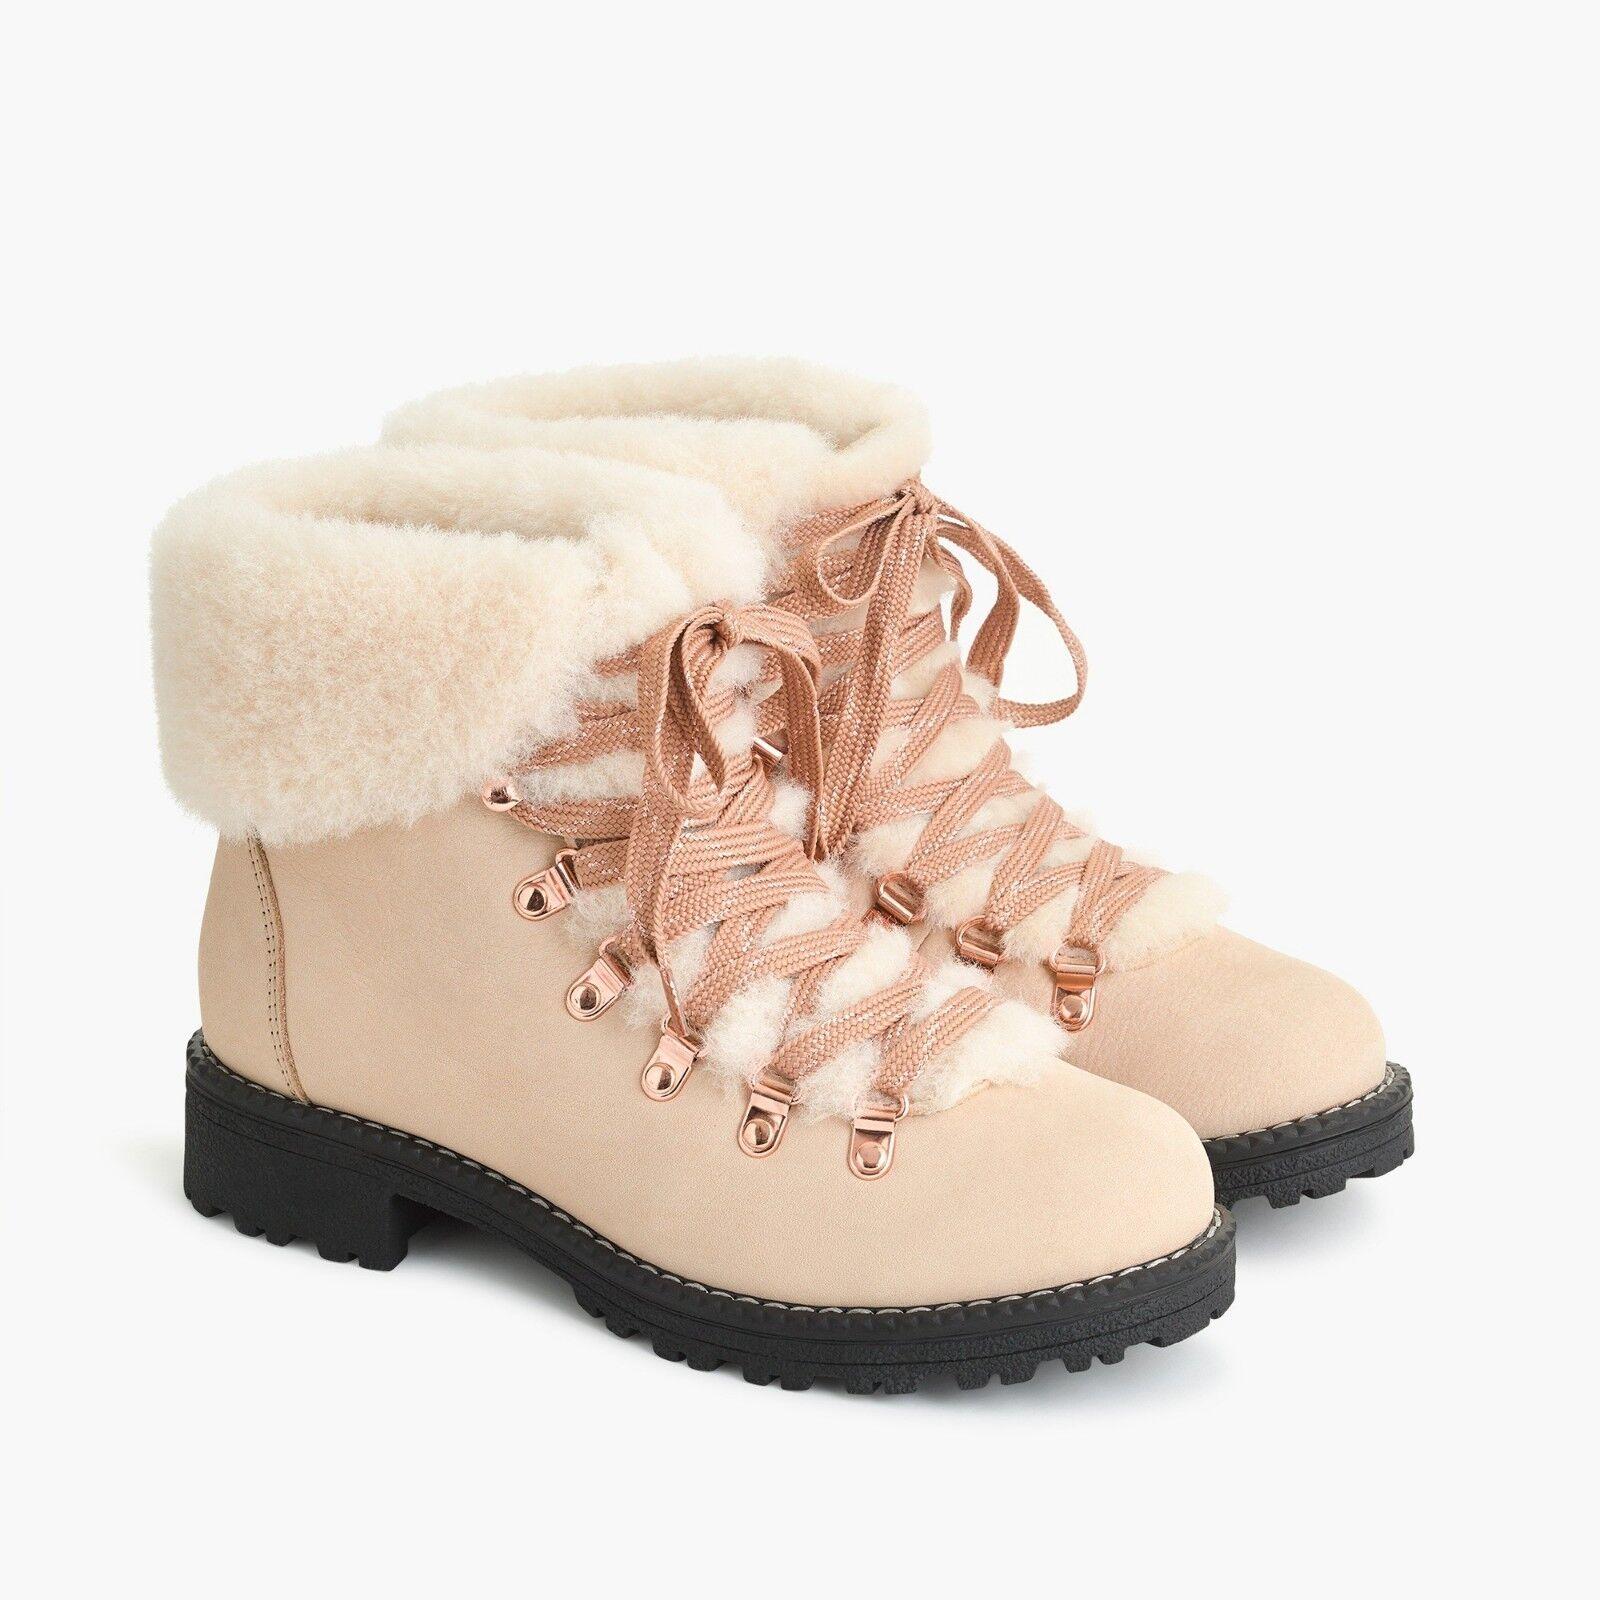 NIB J.CREW  178 Nordic Boots DUNE F8444 SZ 9M 9 nubuck leather winter snow